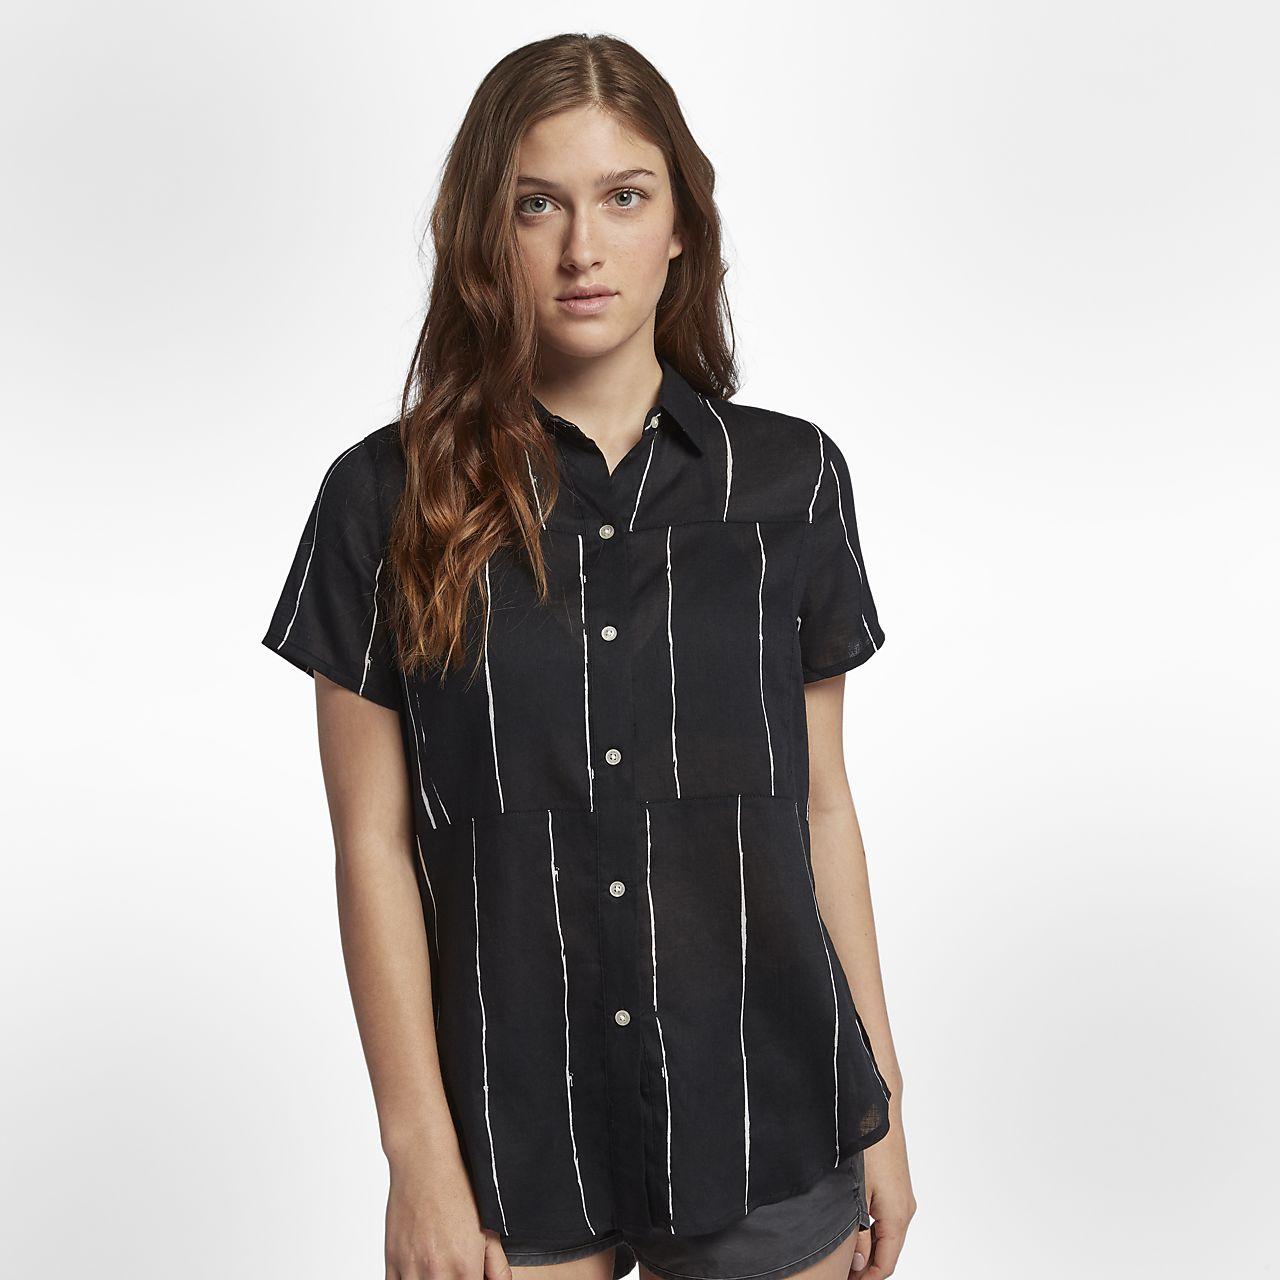 0aaa684ba6 Camisa de manga curta Hurley Wilson Static para mulher. Nike.com PT